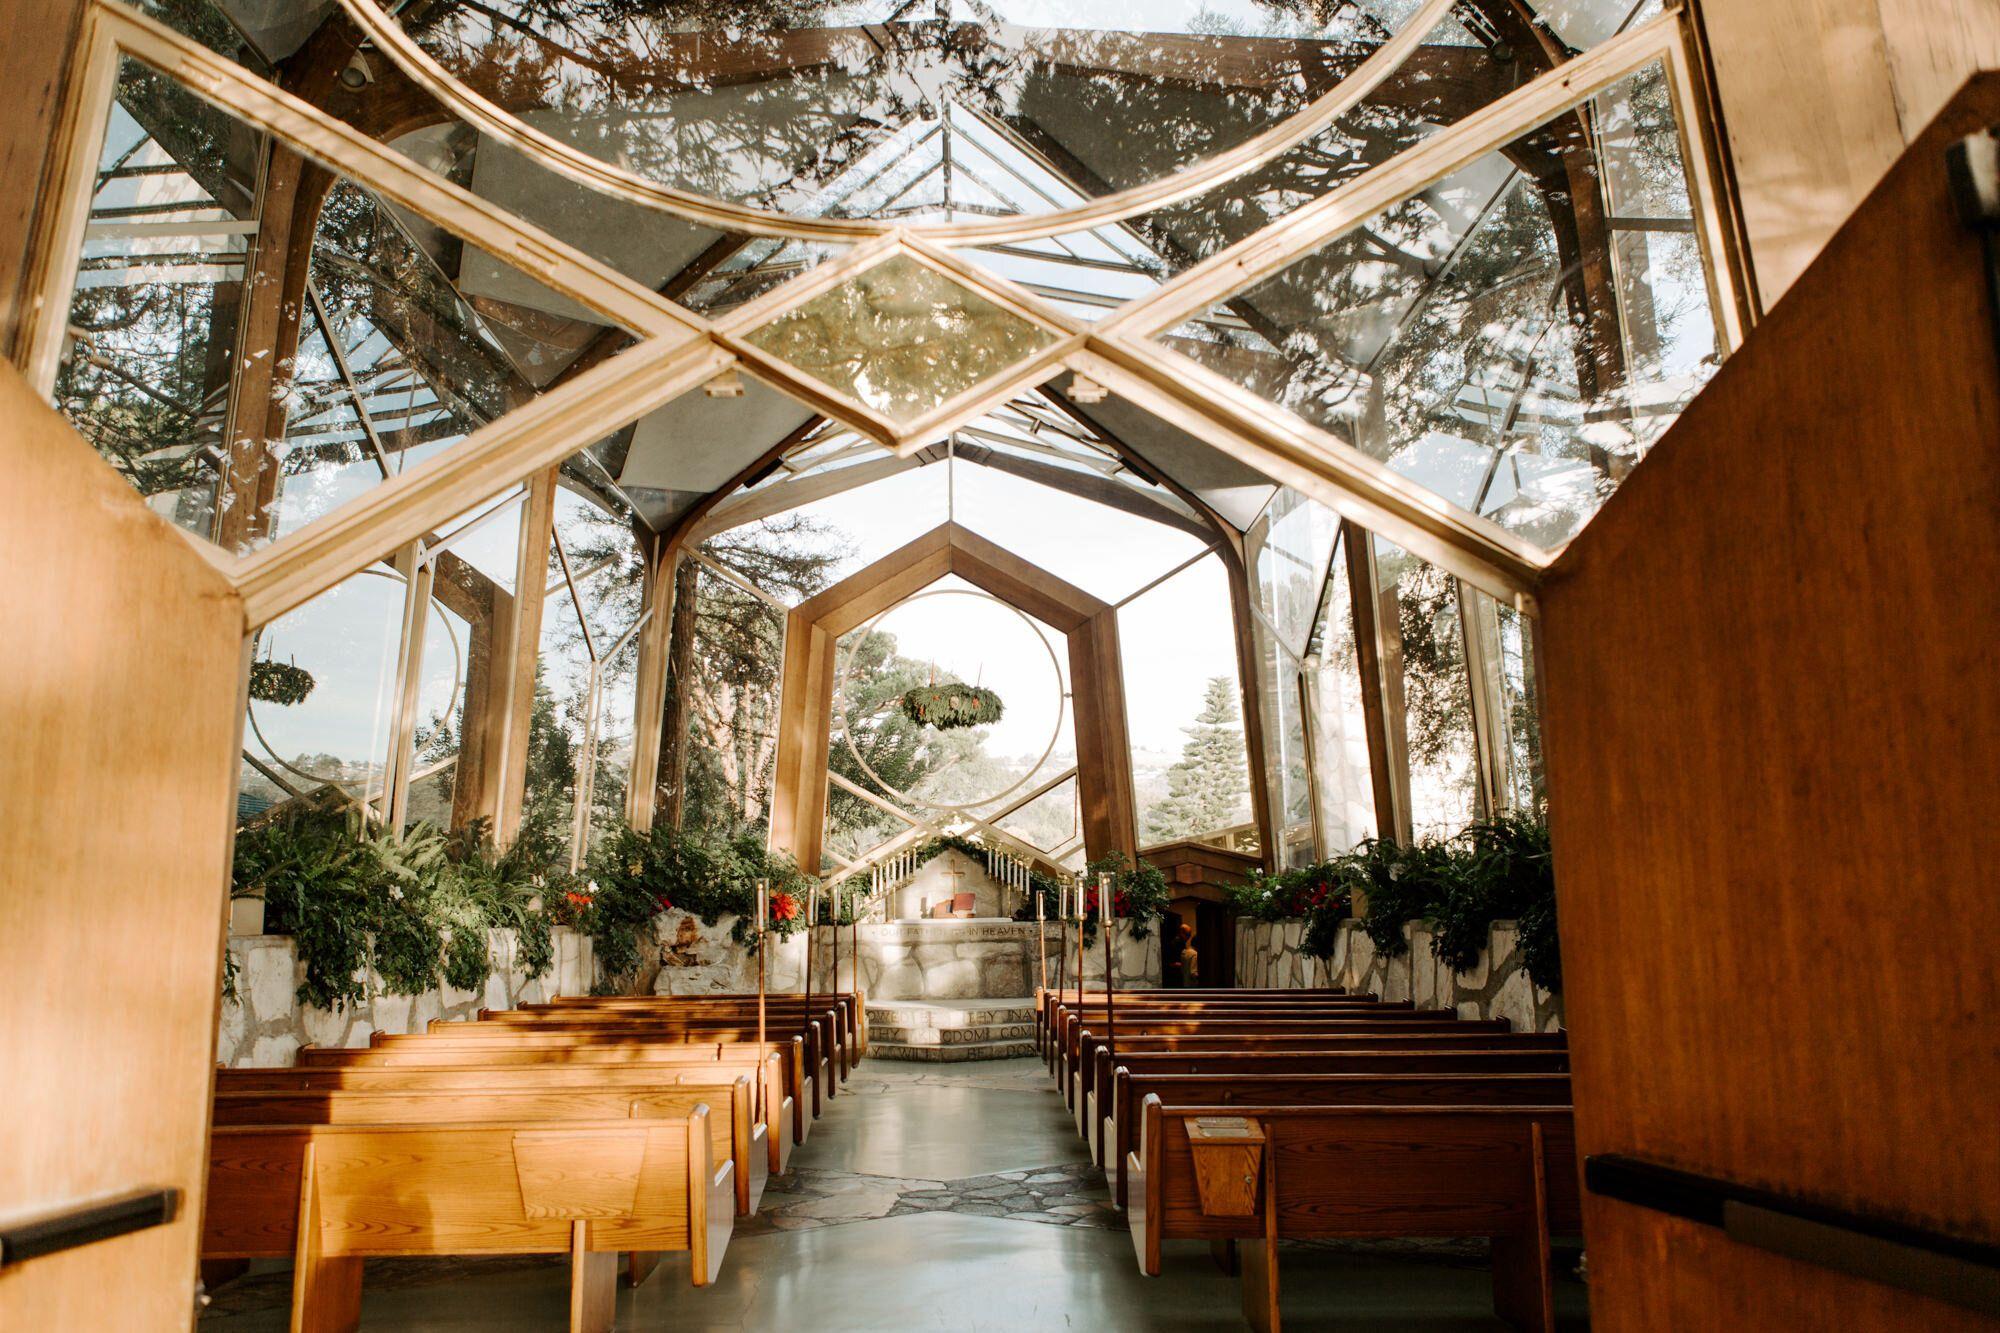 Wayfarers Chapel The Loft On Pine Wedding Photography Kelsey And Brandon Like Morning Sun Los Angeles Photography And Videography In 2020 Wayfarers Chapel Southern California Wedding Photography Photography And Videography